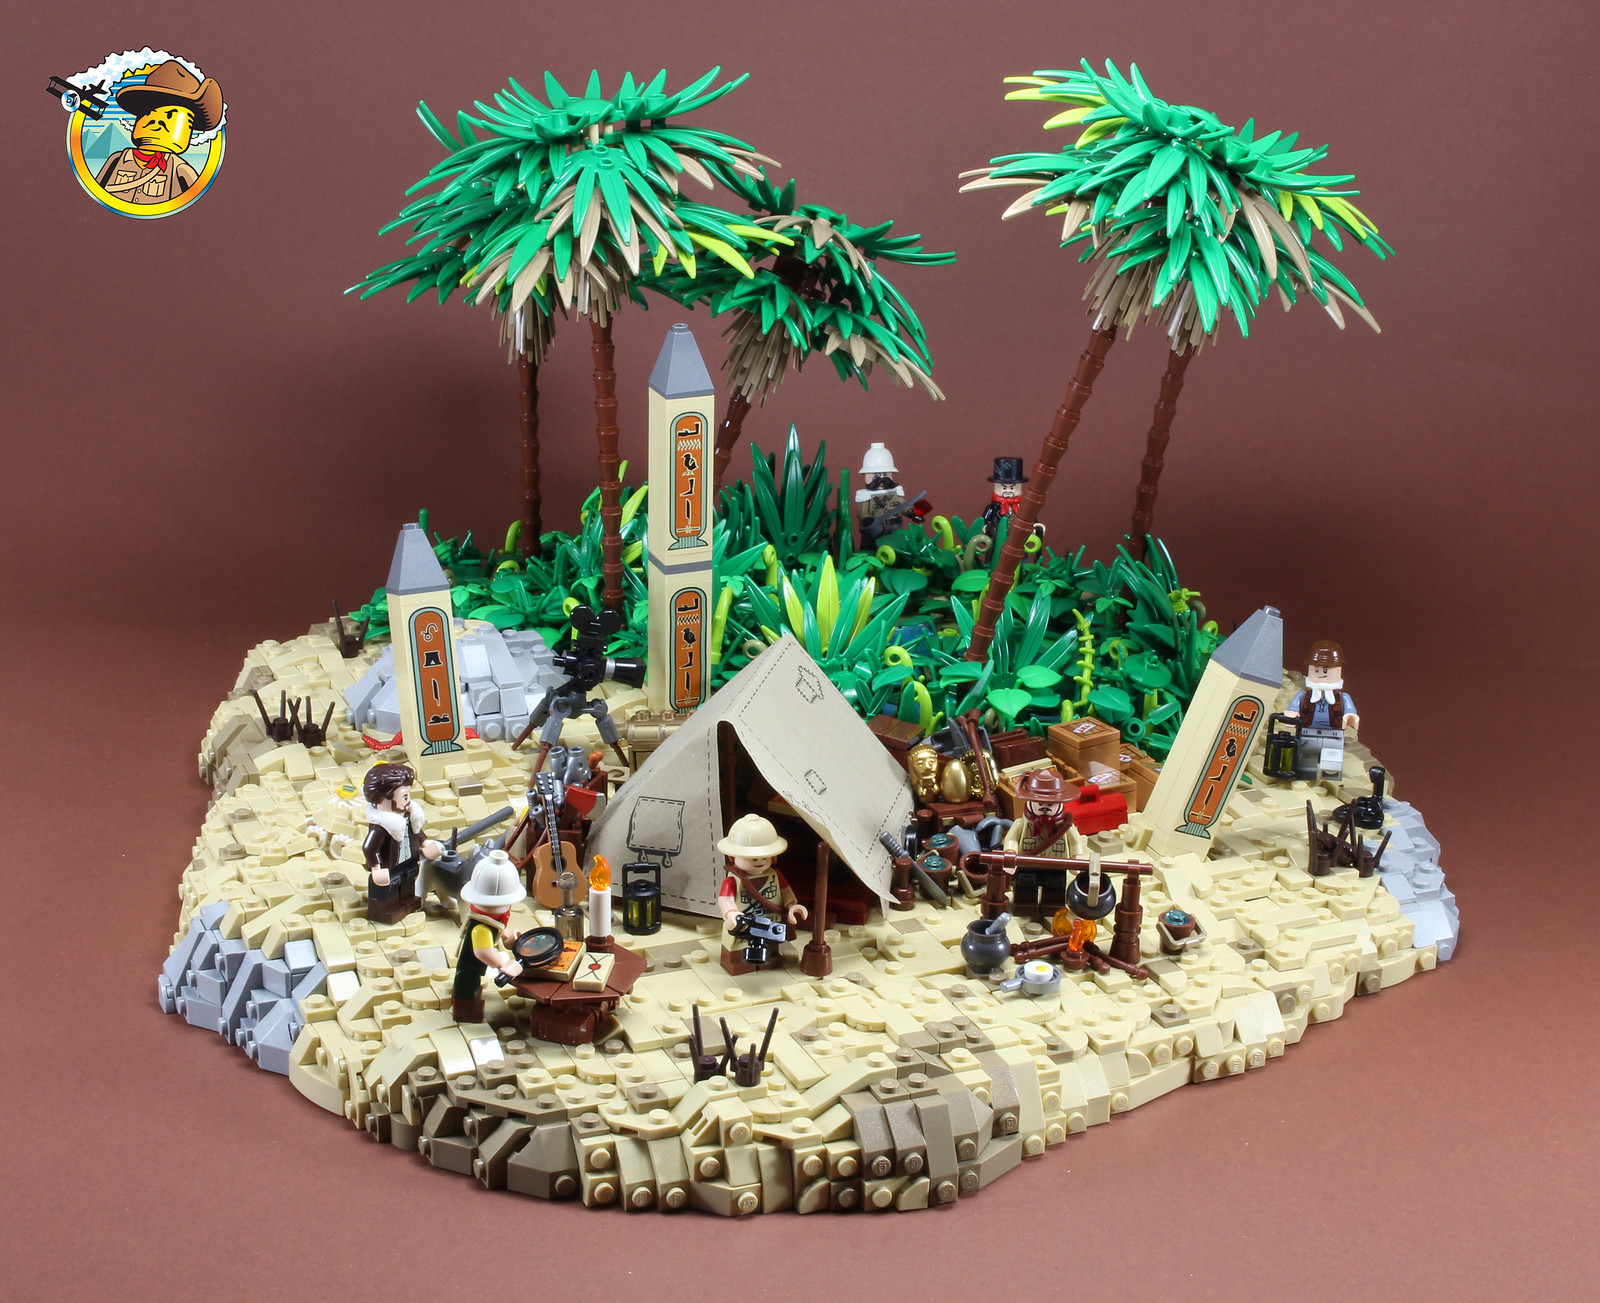 Adventurers - Oasis campsite